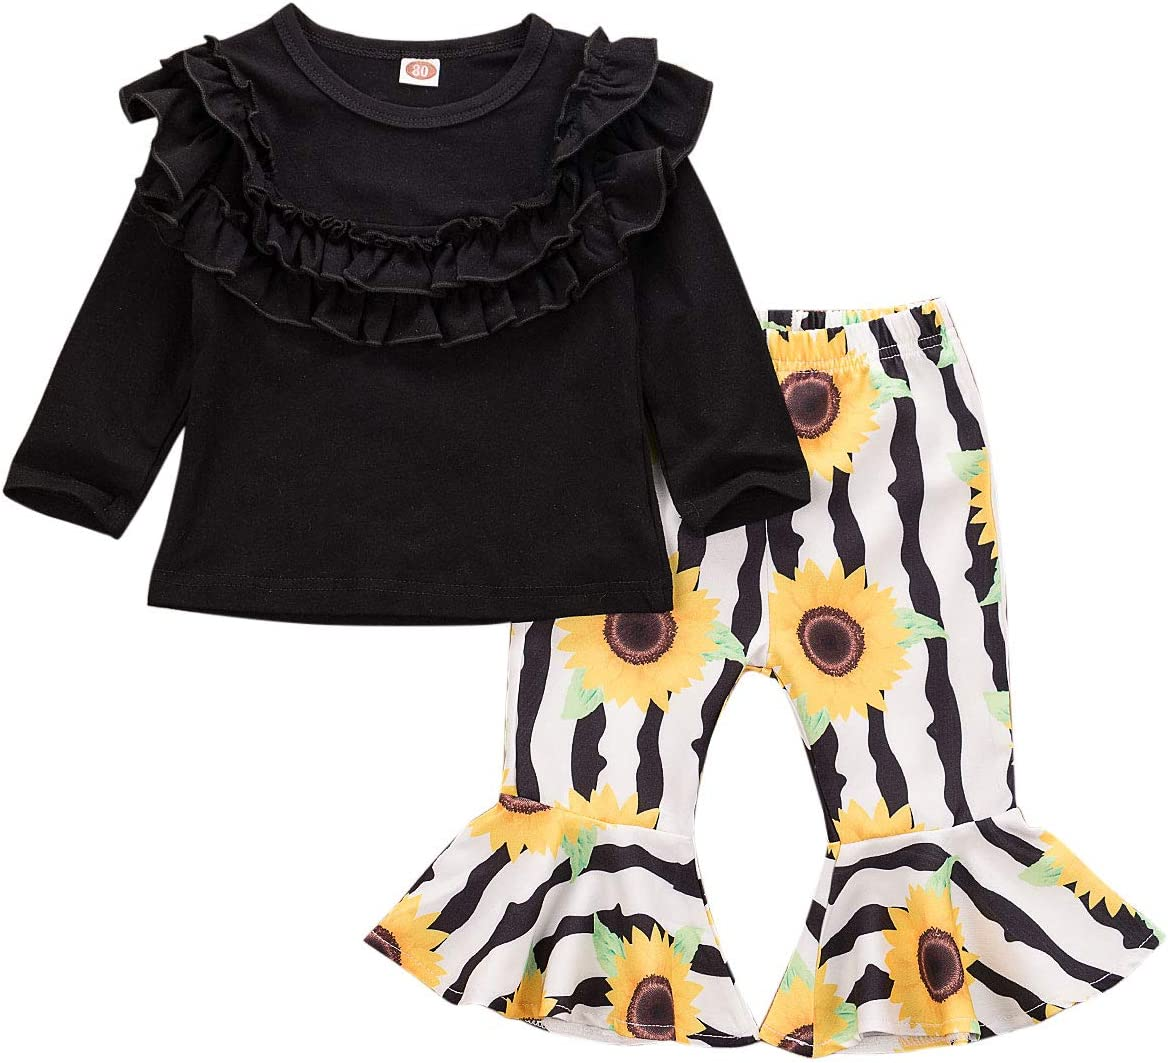 Newborn Boy Girl Solid Colors Clothes Pants Set Baby Kids Long Sleeve Tops Sweatsuit Set